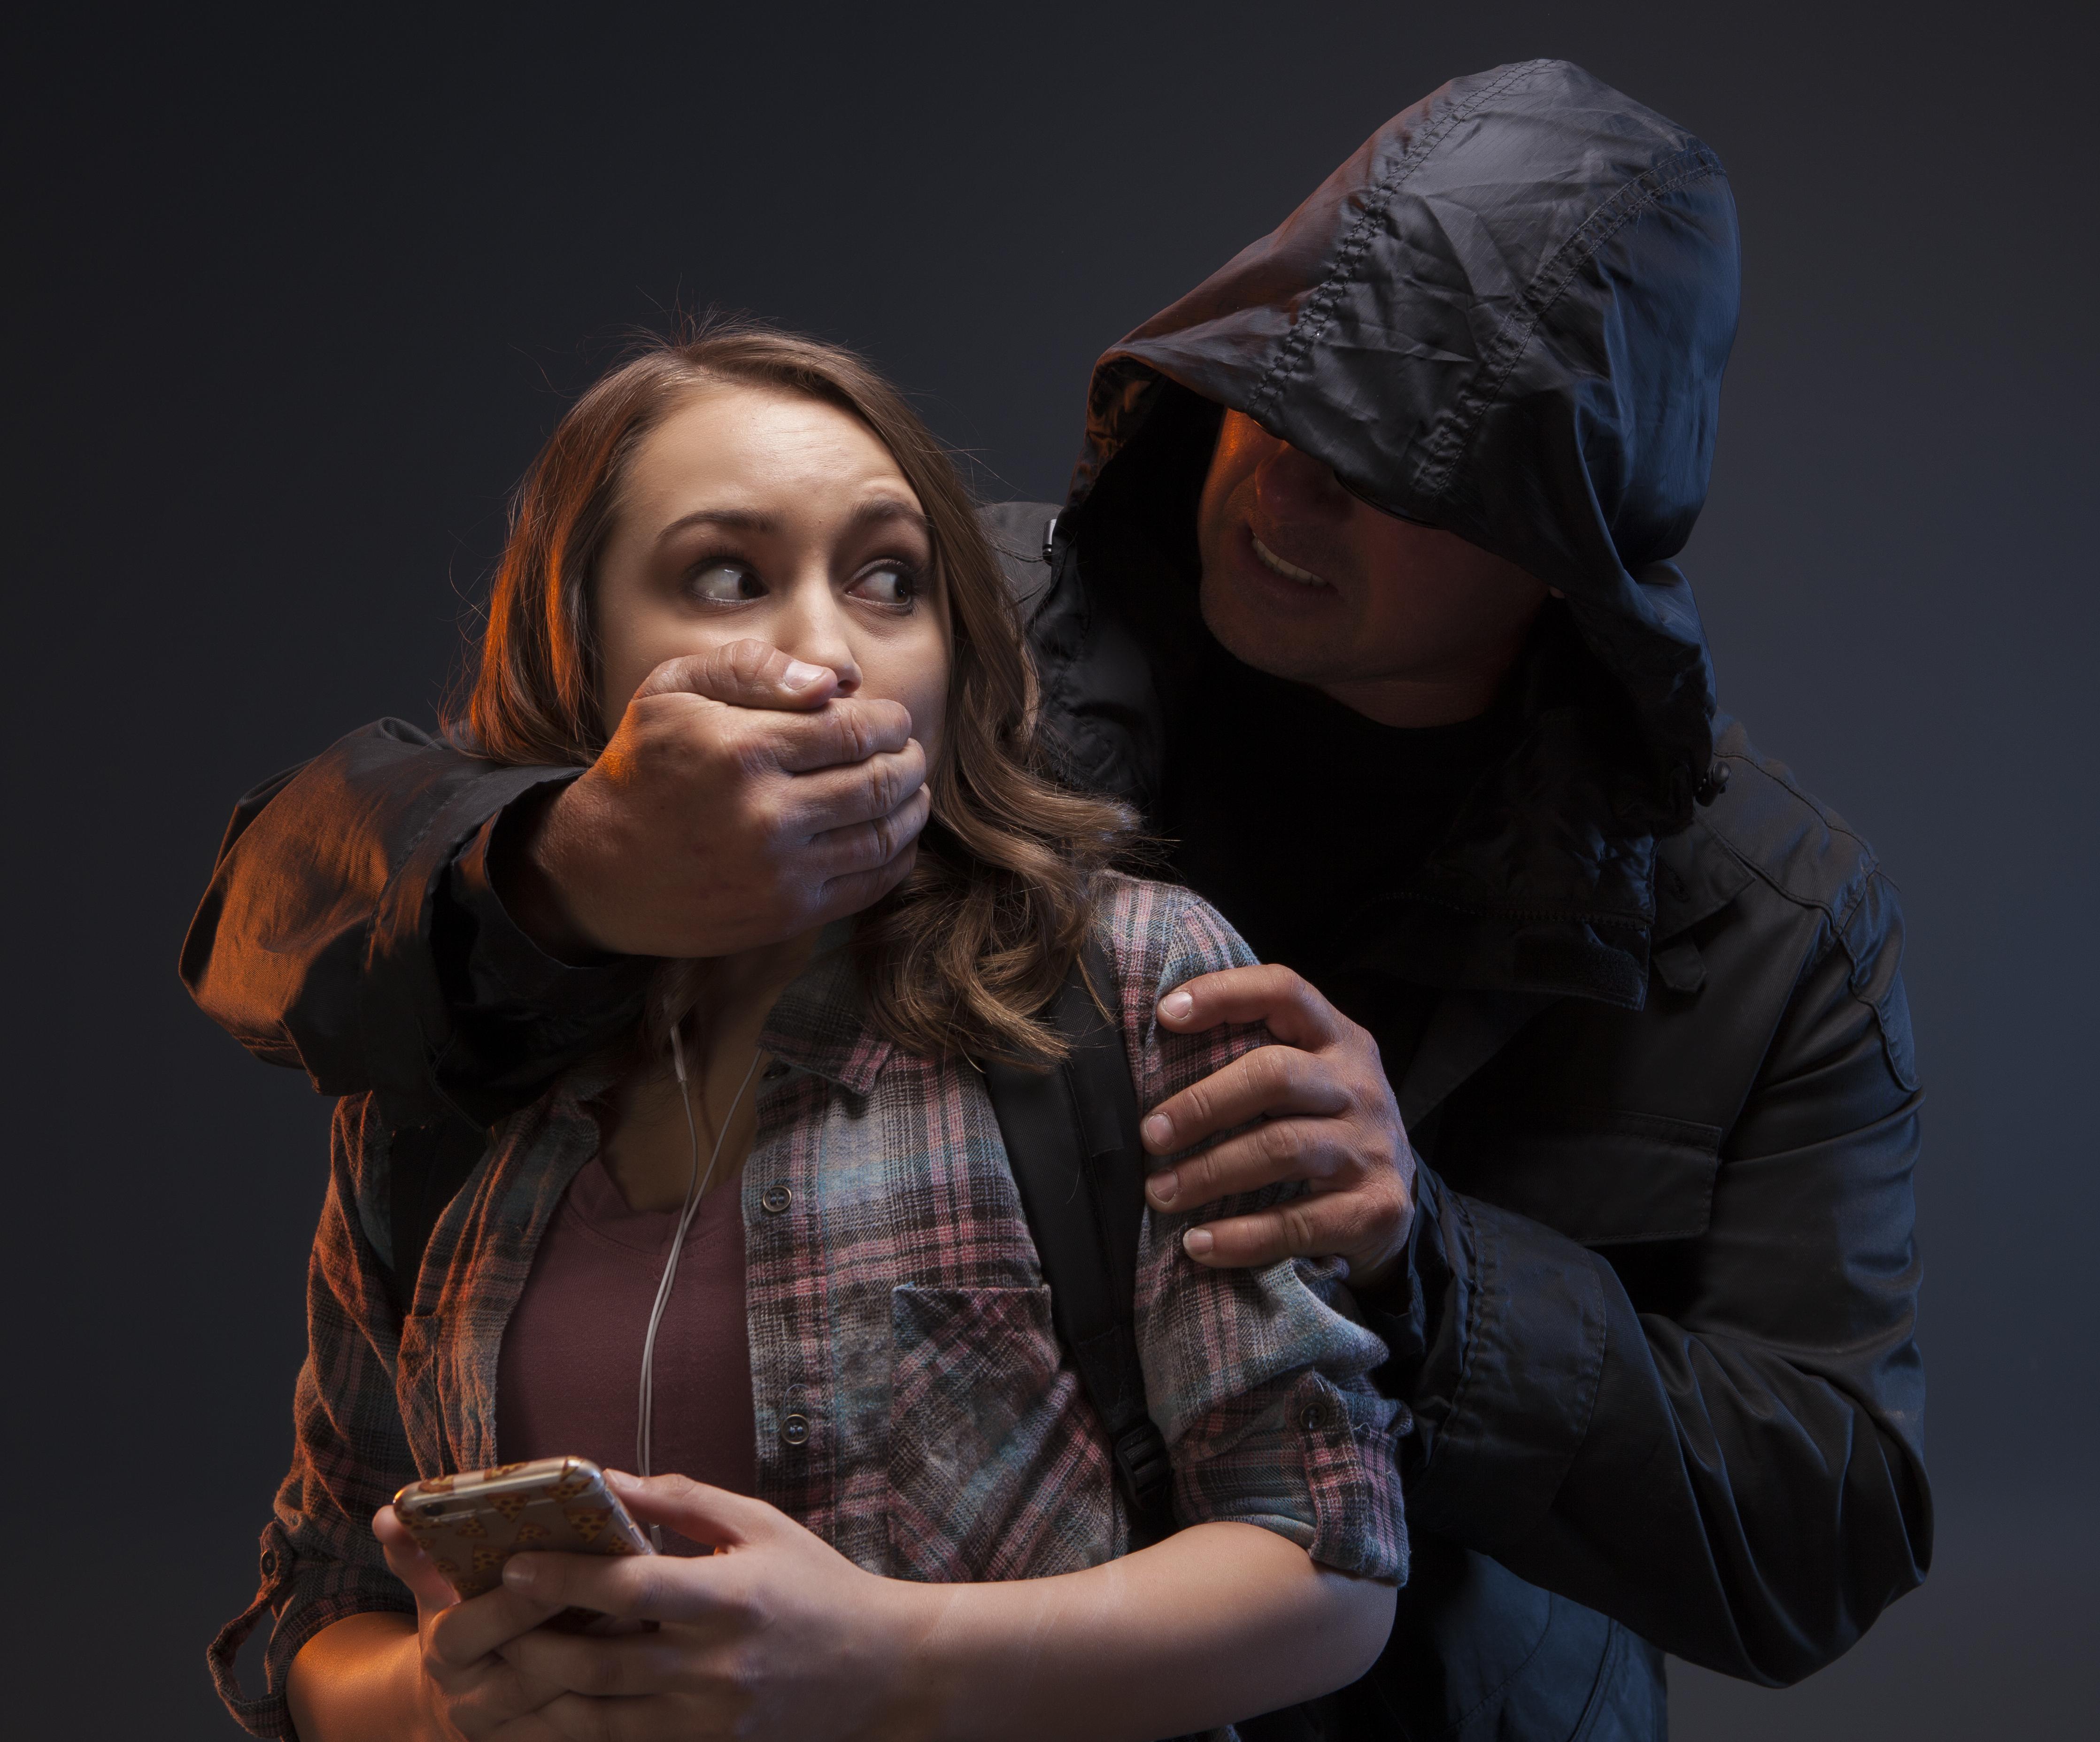 Brutalny atak na kobiete